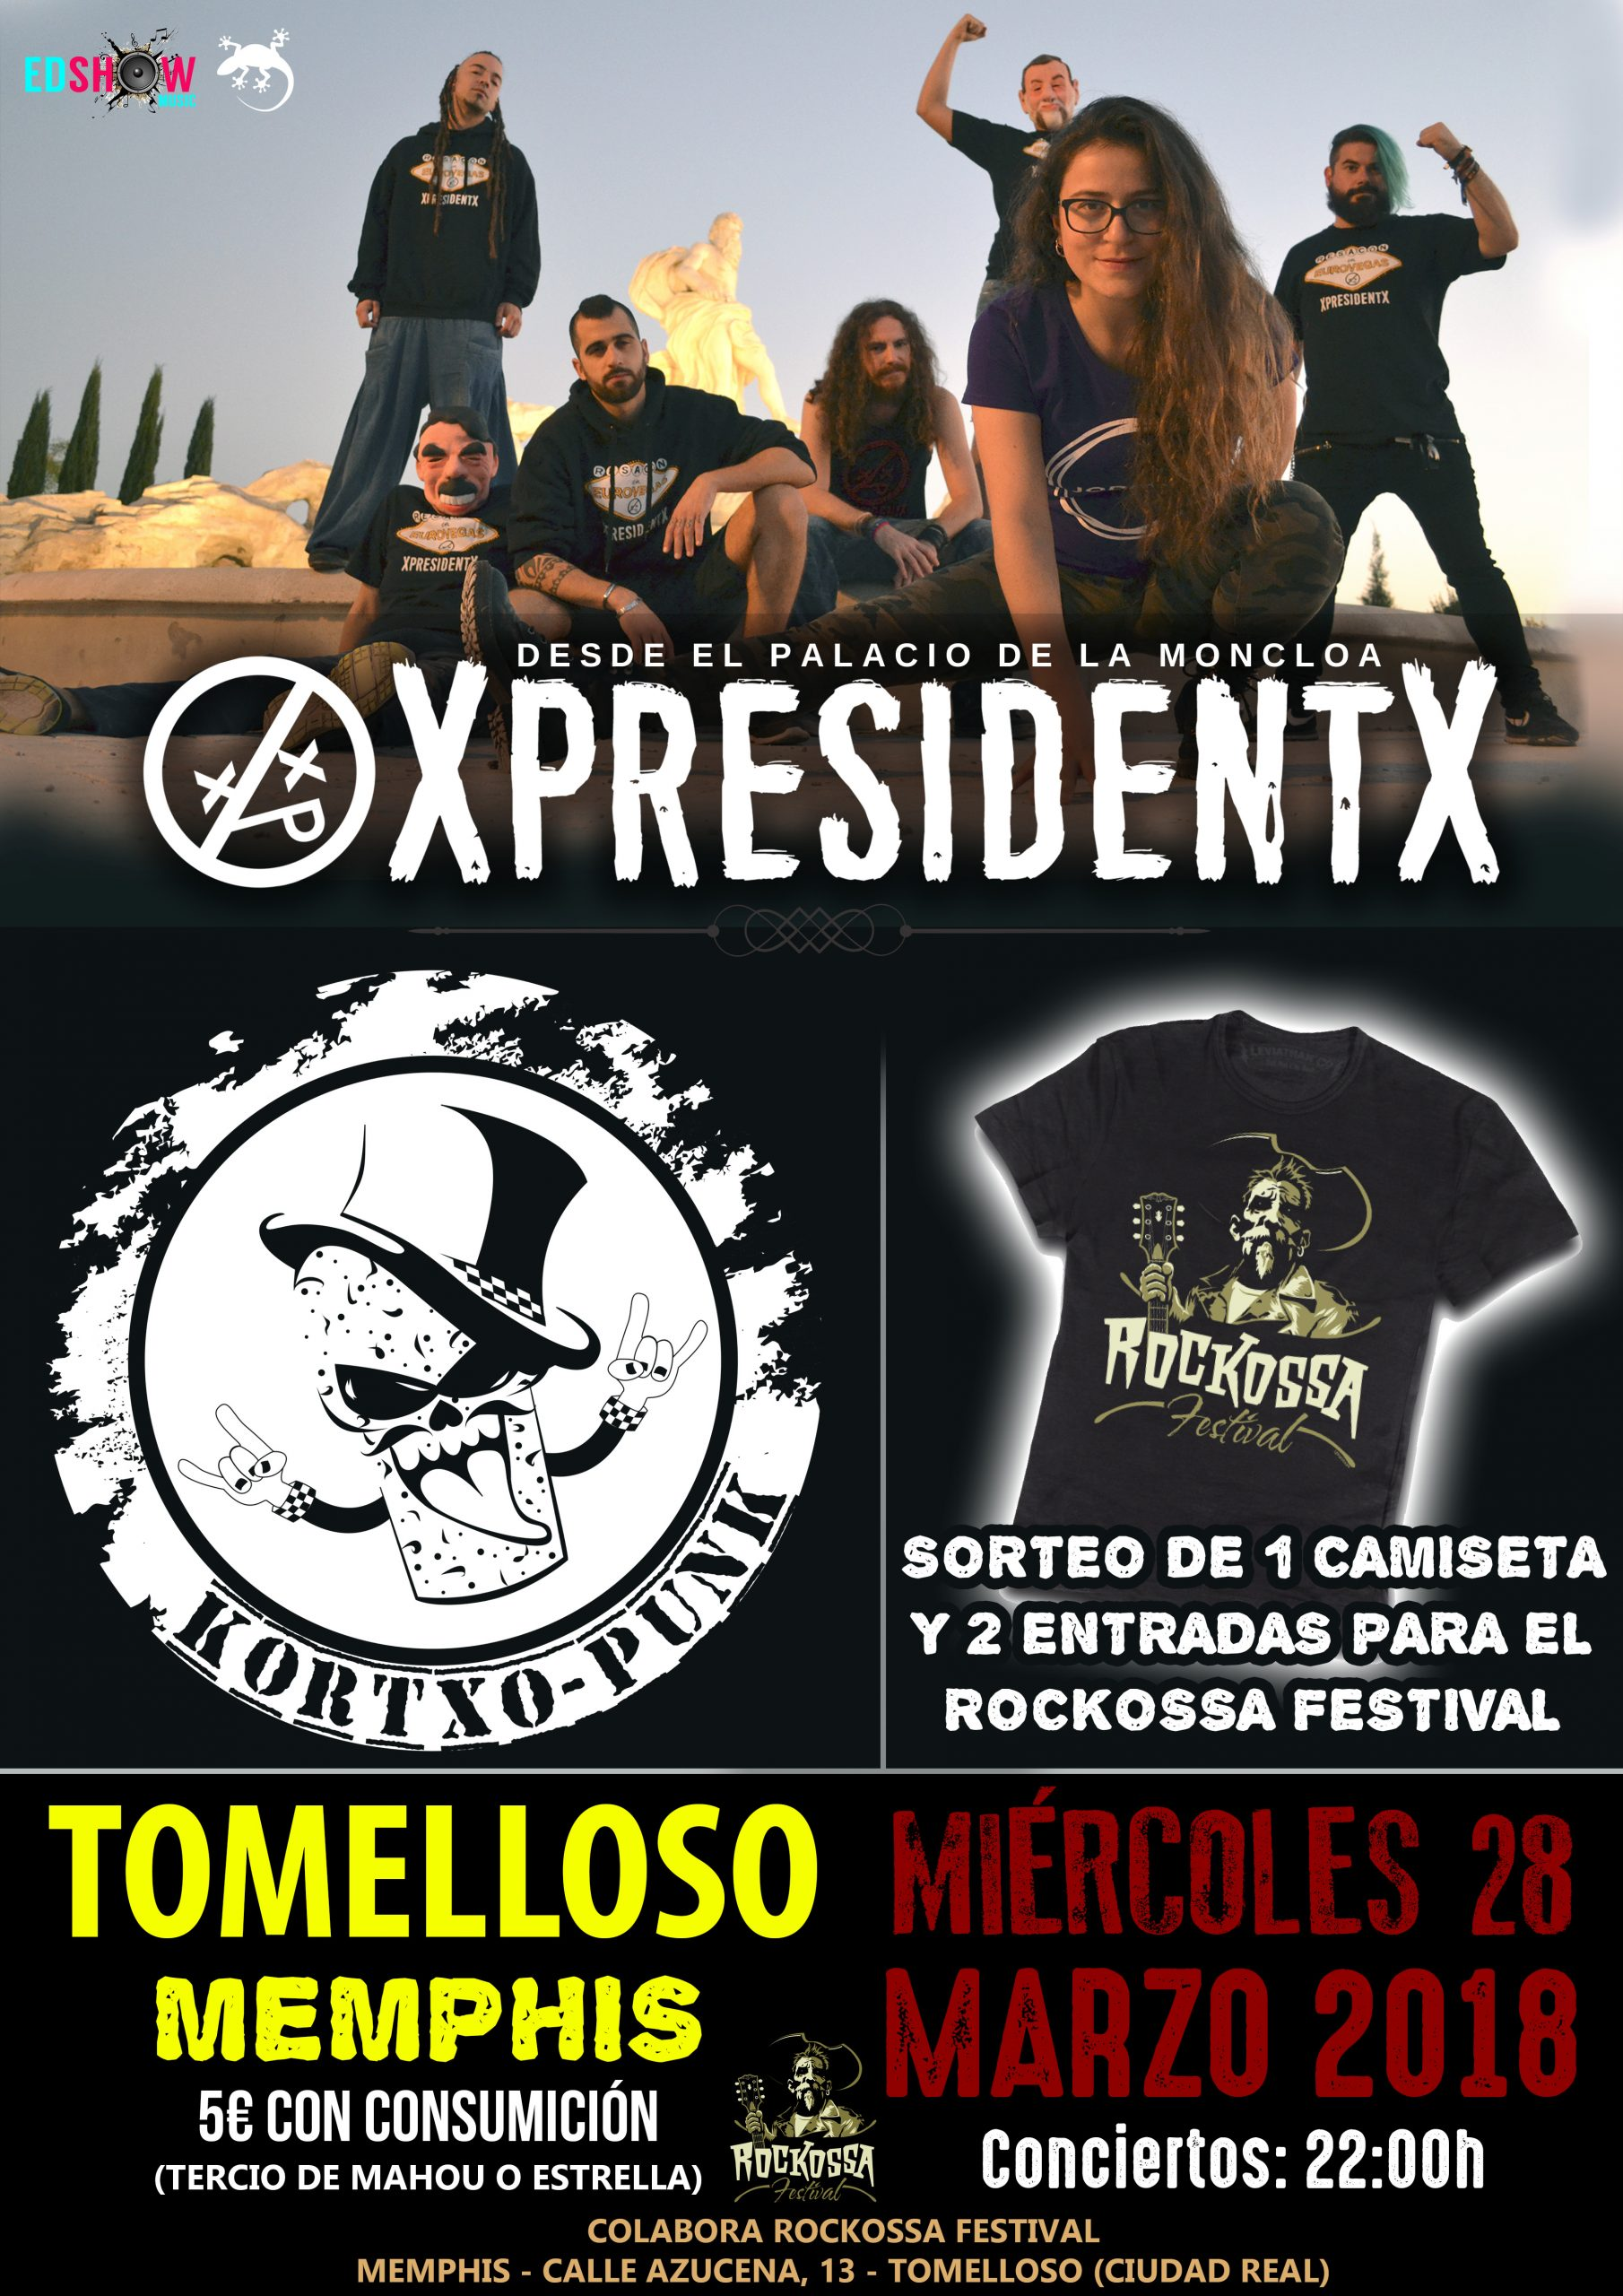 Grupo Rap Metal Hardcore XpresidentX en Tomelloso